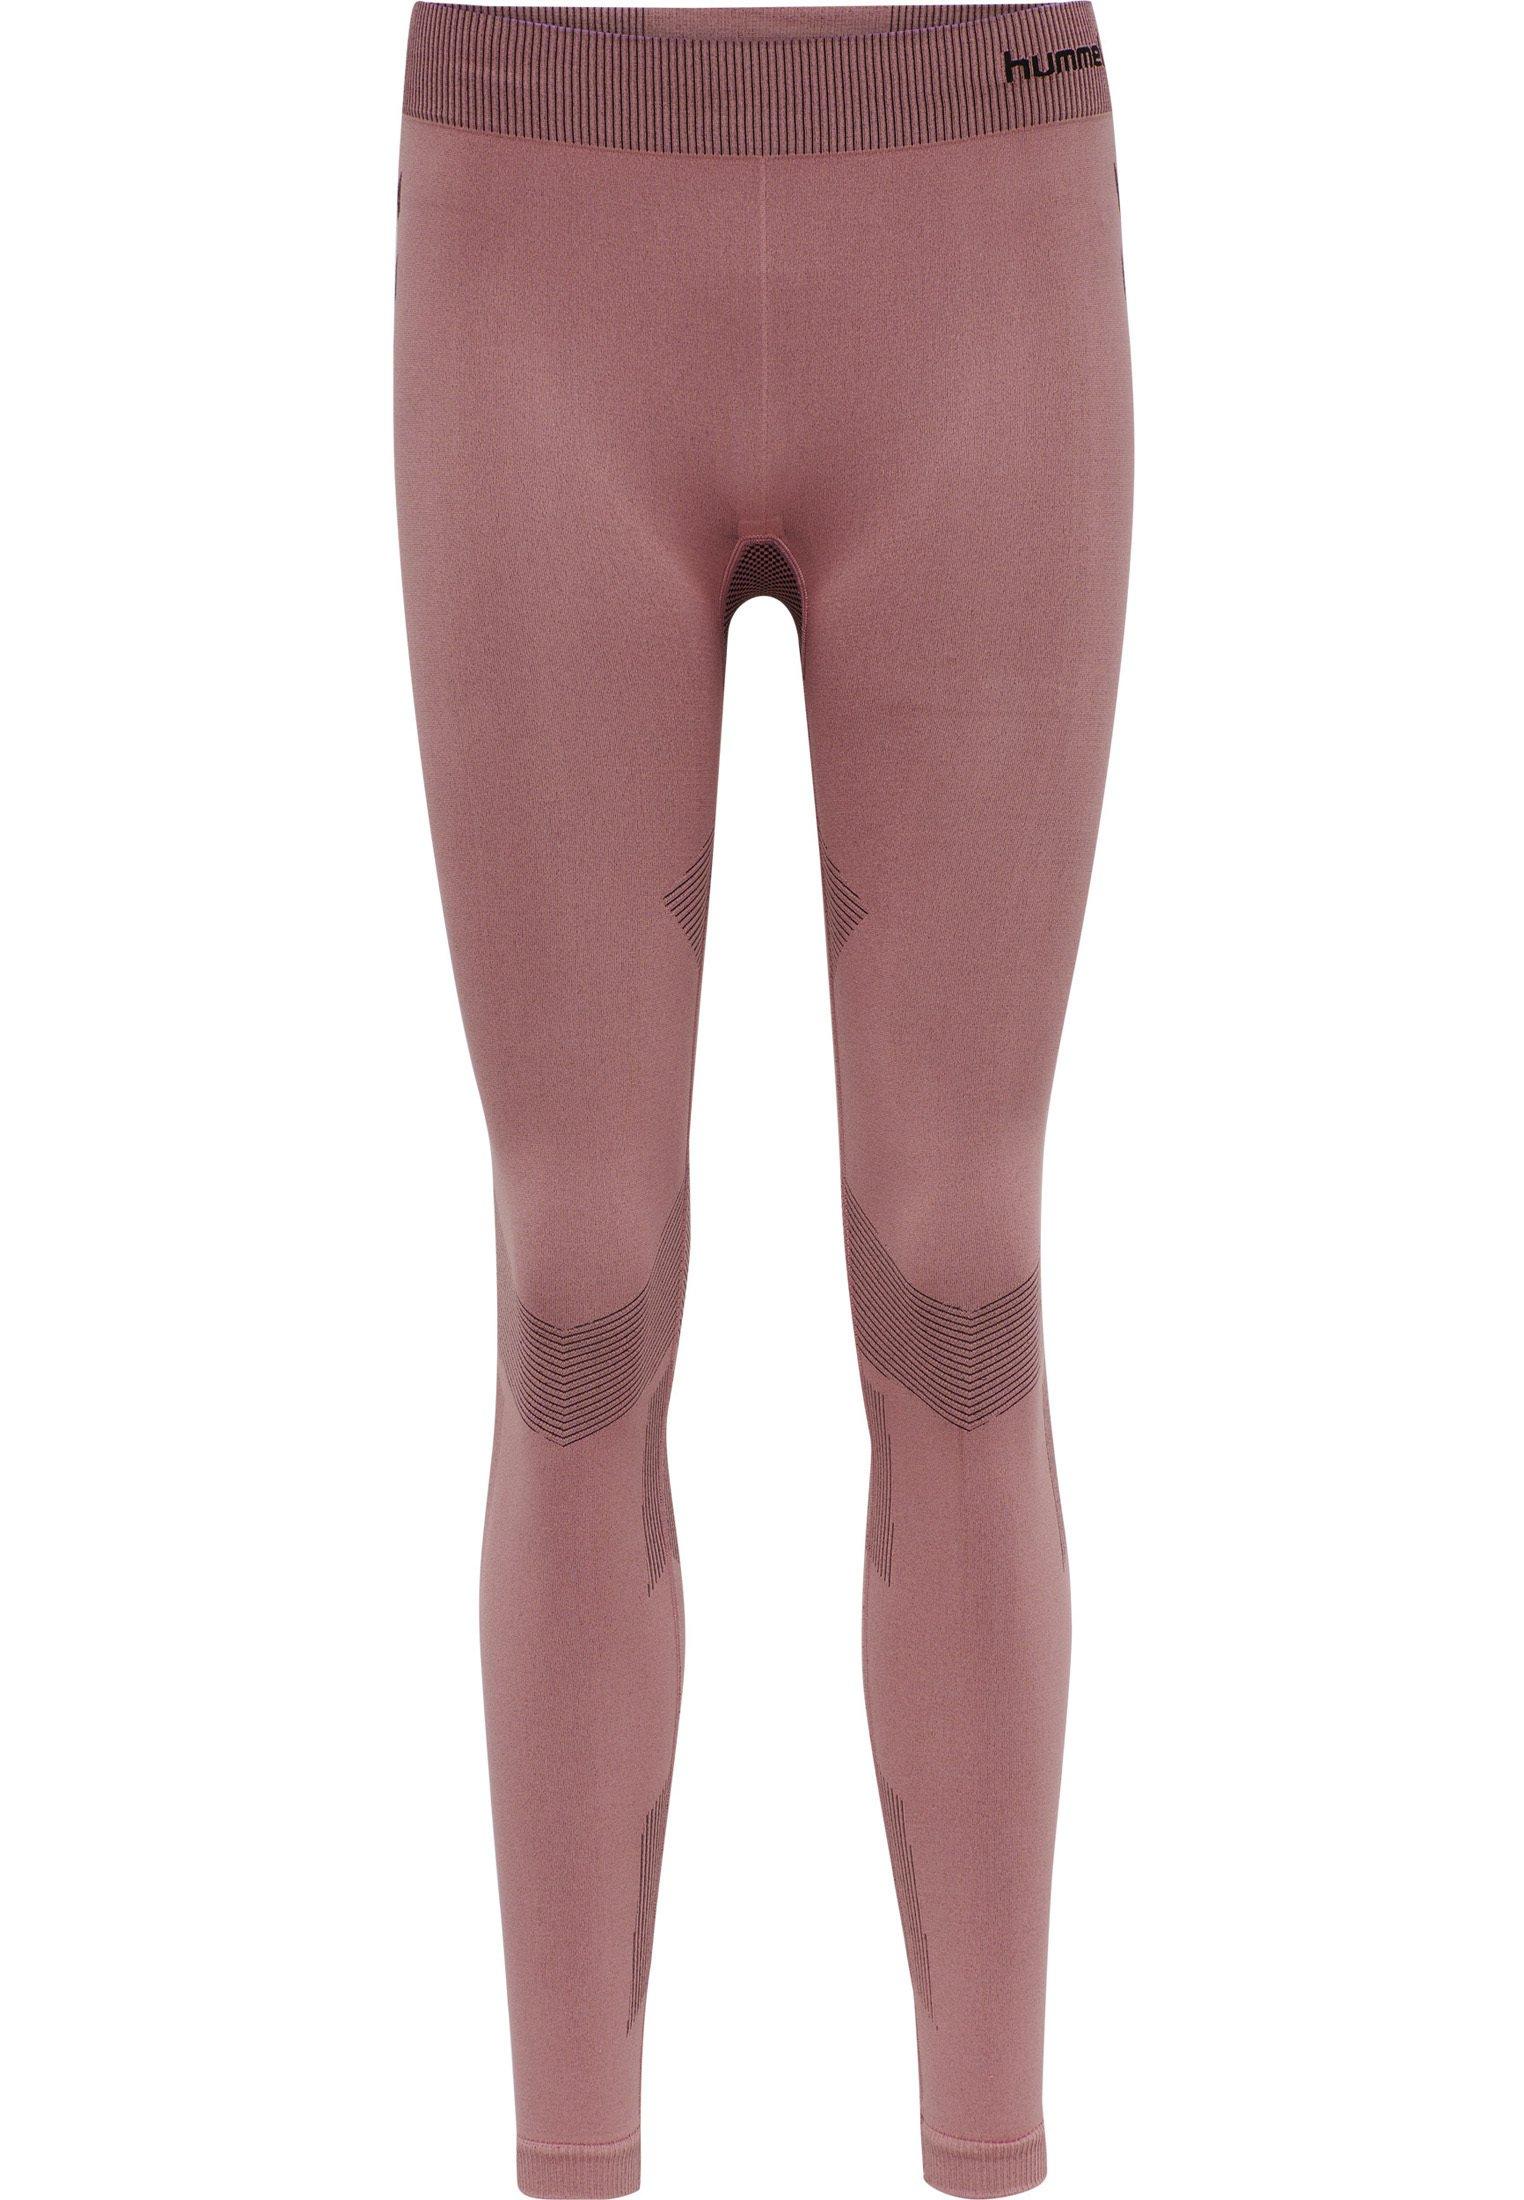 Femme FIRST SEAMLESS - Collants